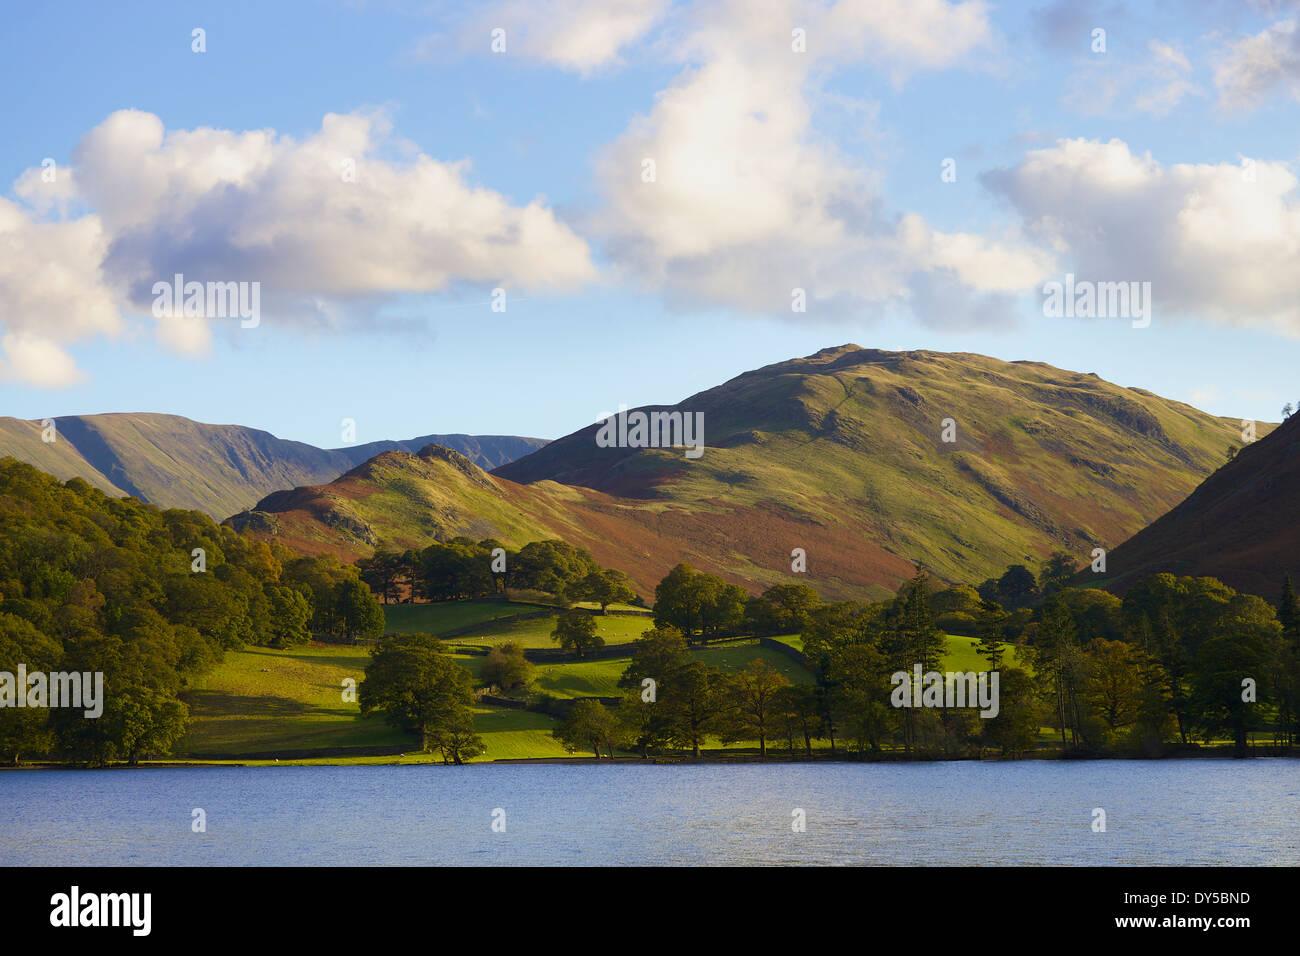 See-Szene mit Feldern, Bäumen und Hügeln. Beda Kopf, Sandwick Bay, Lake District, England. Stockbild